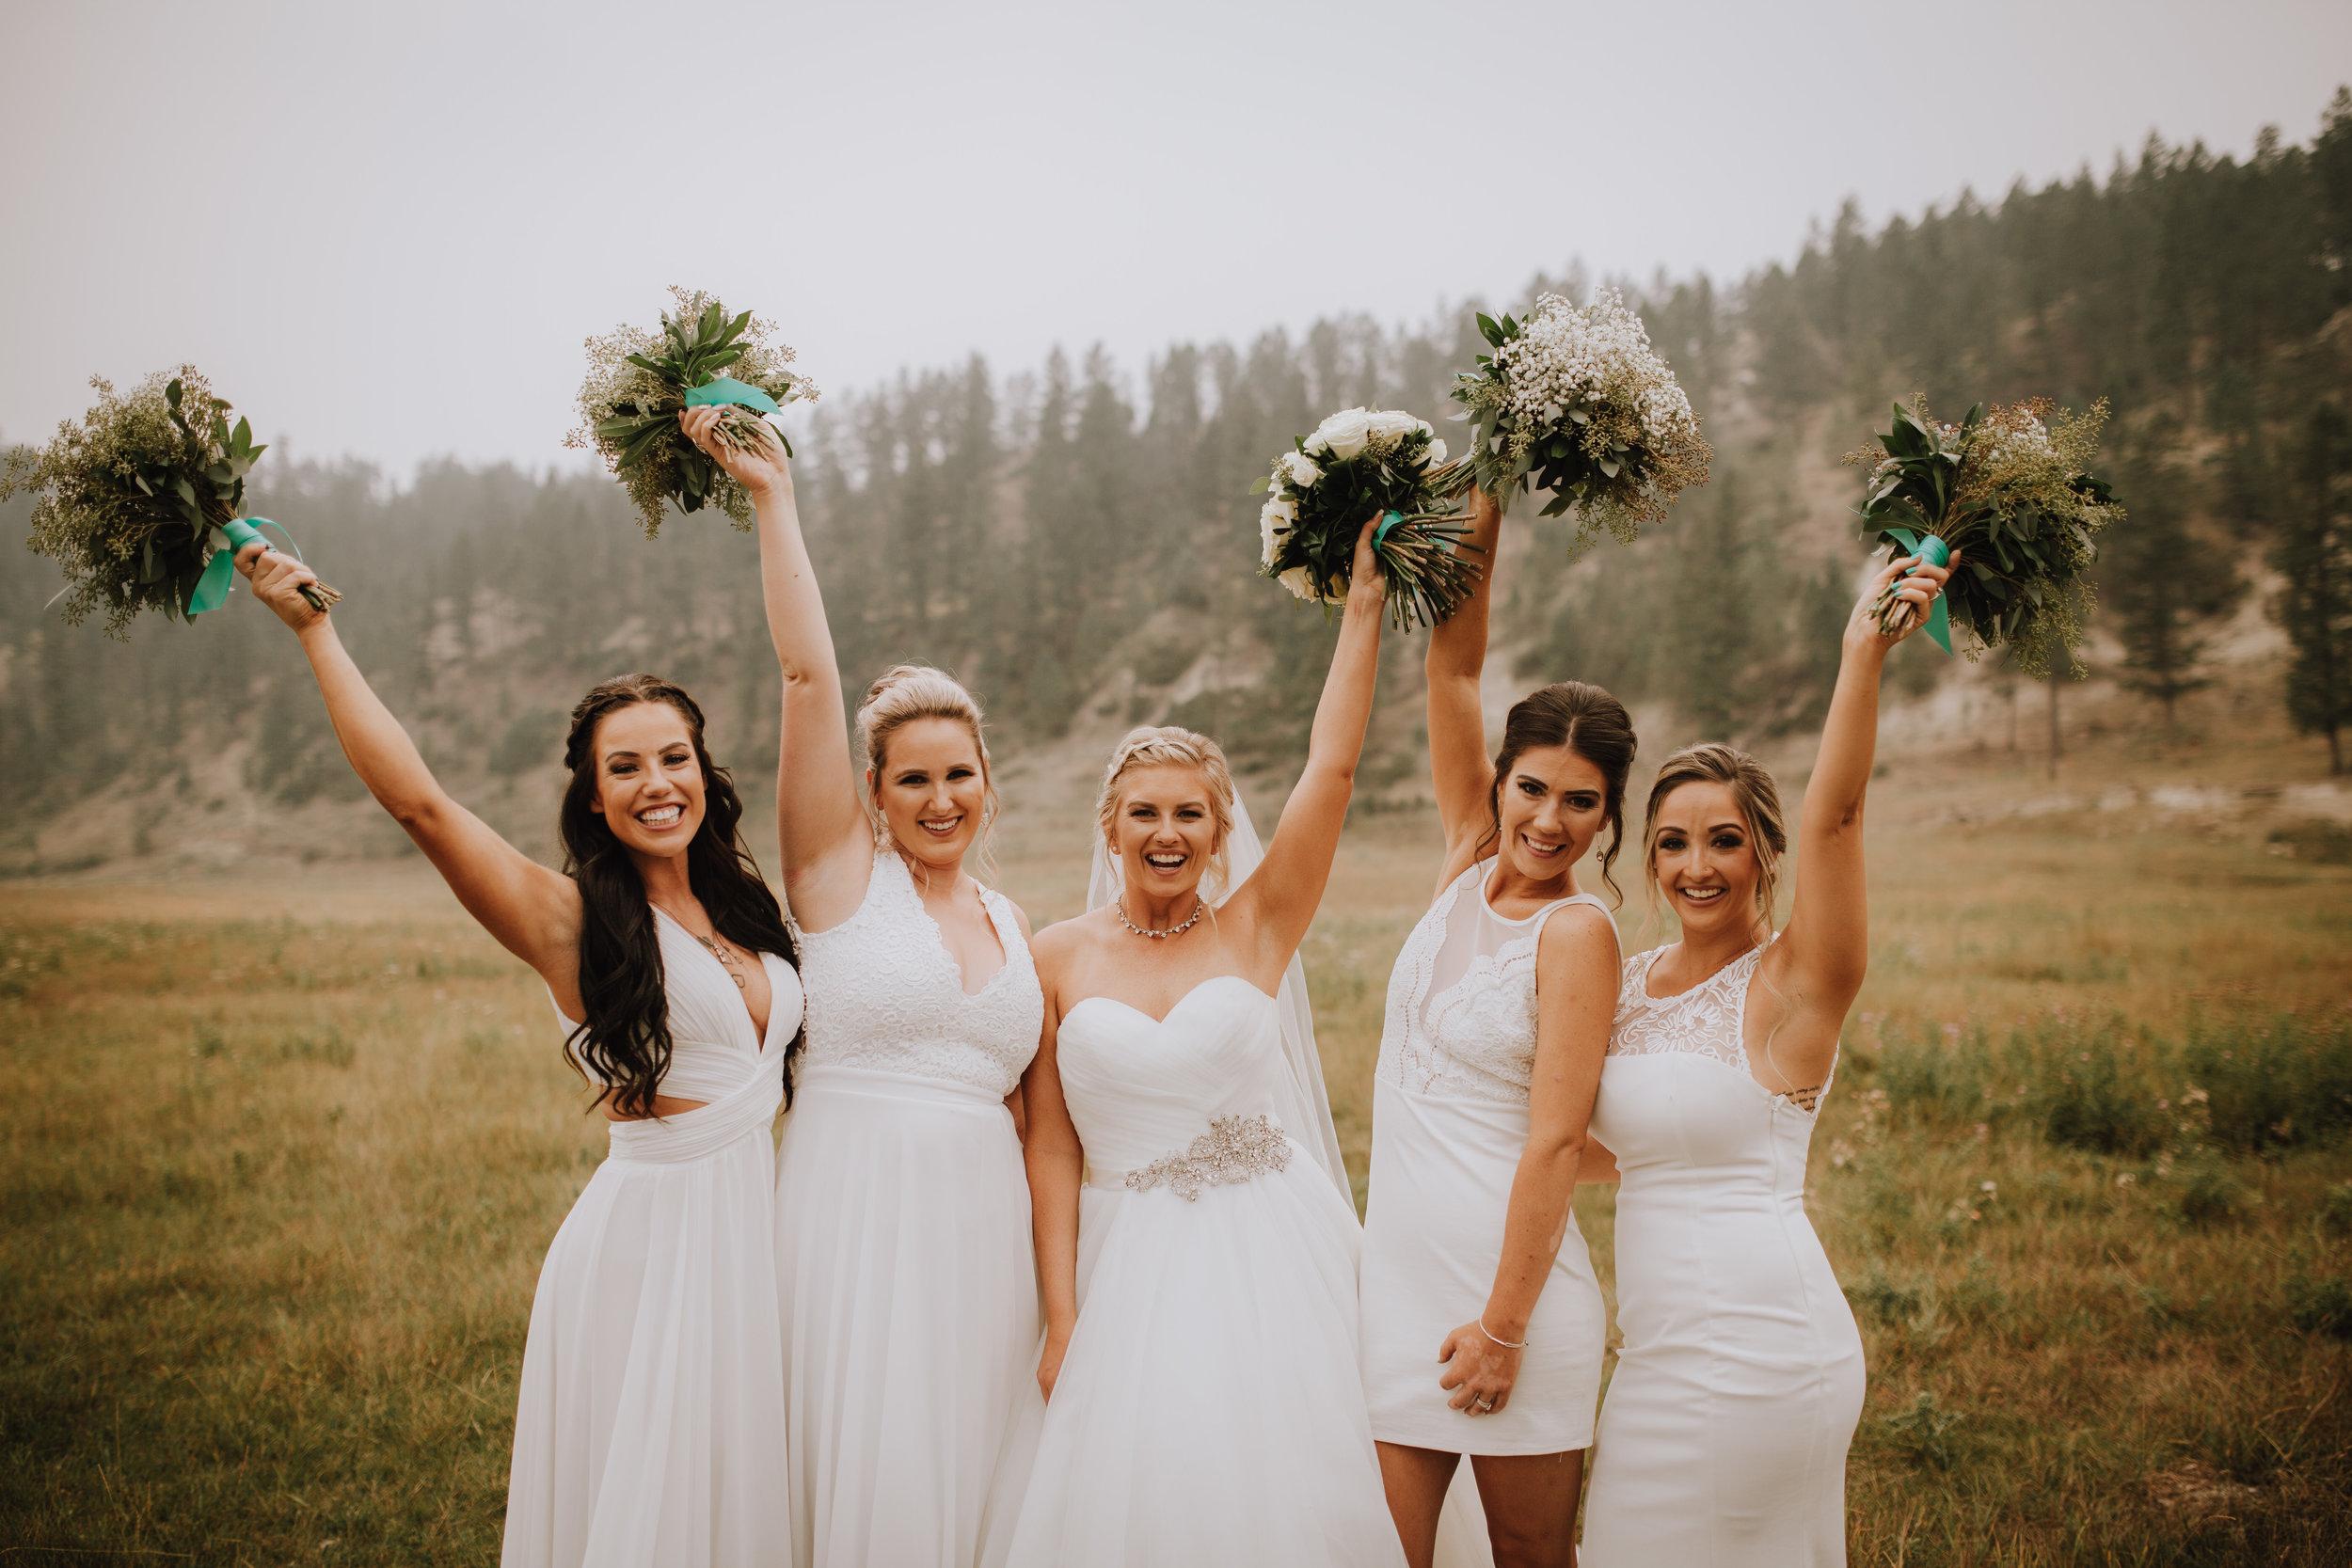 Tyler + Shayla 4 - Bridal Portraits-46.jpg